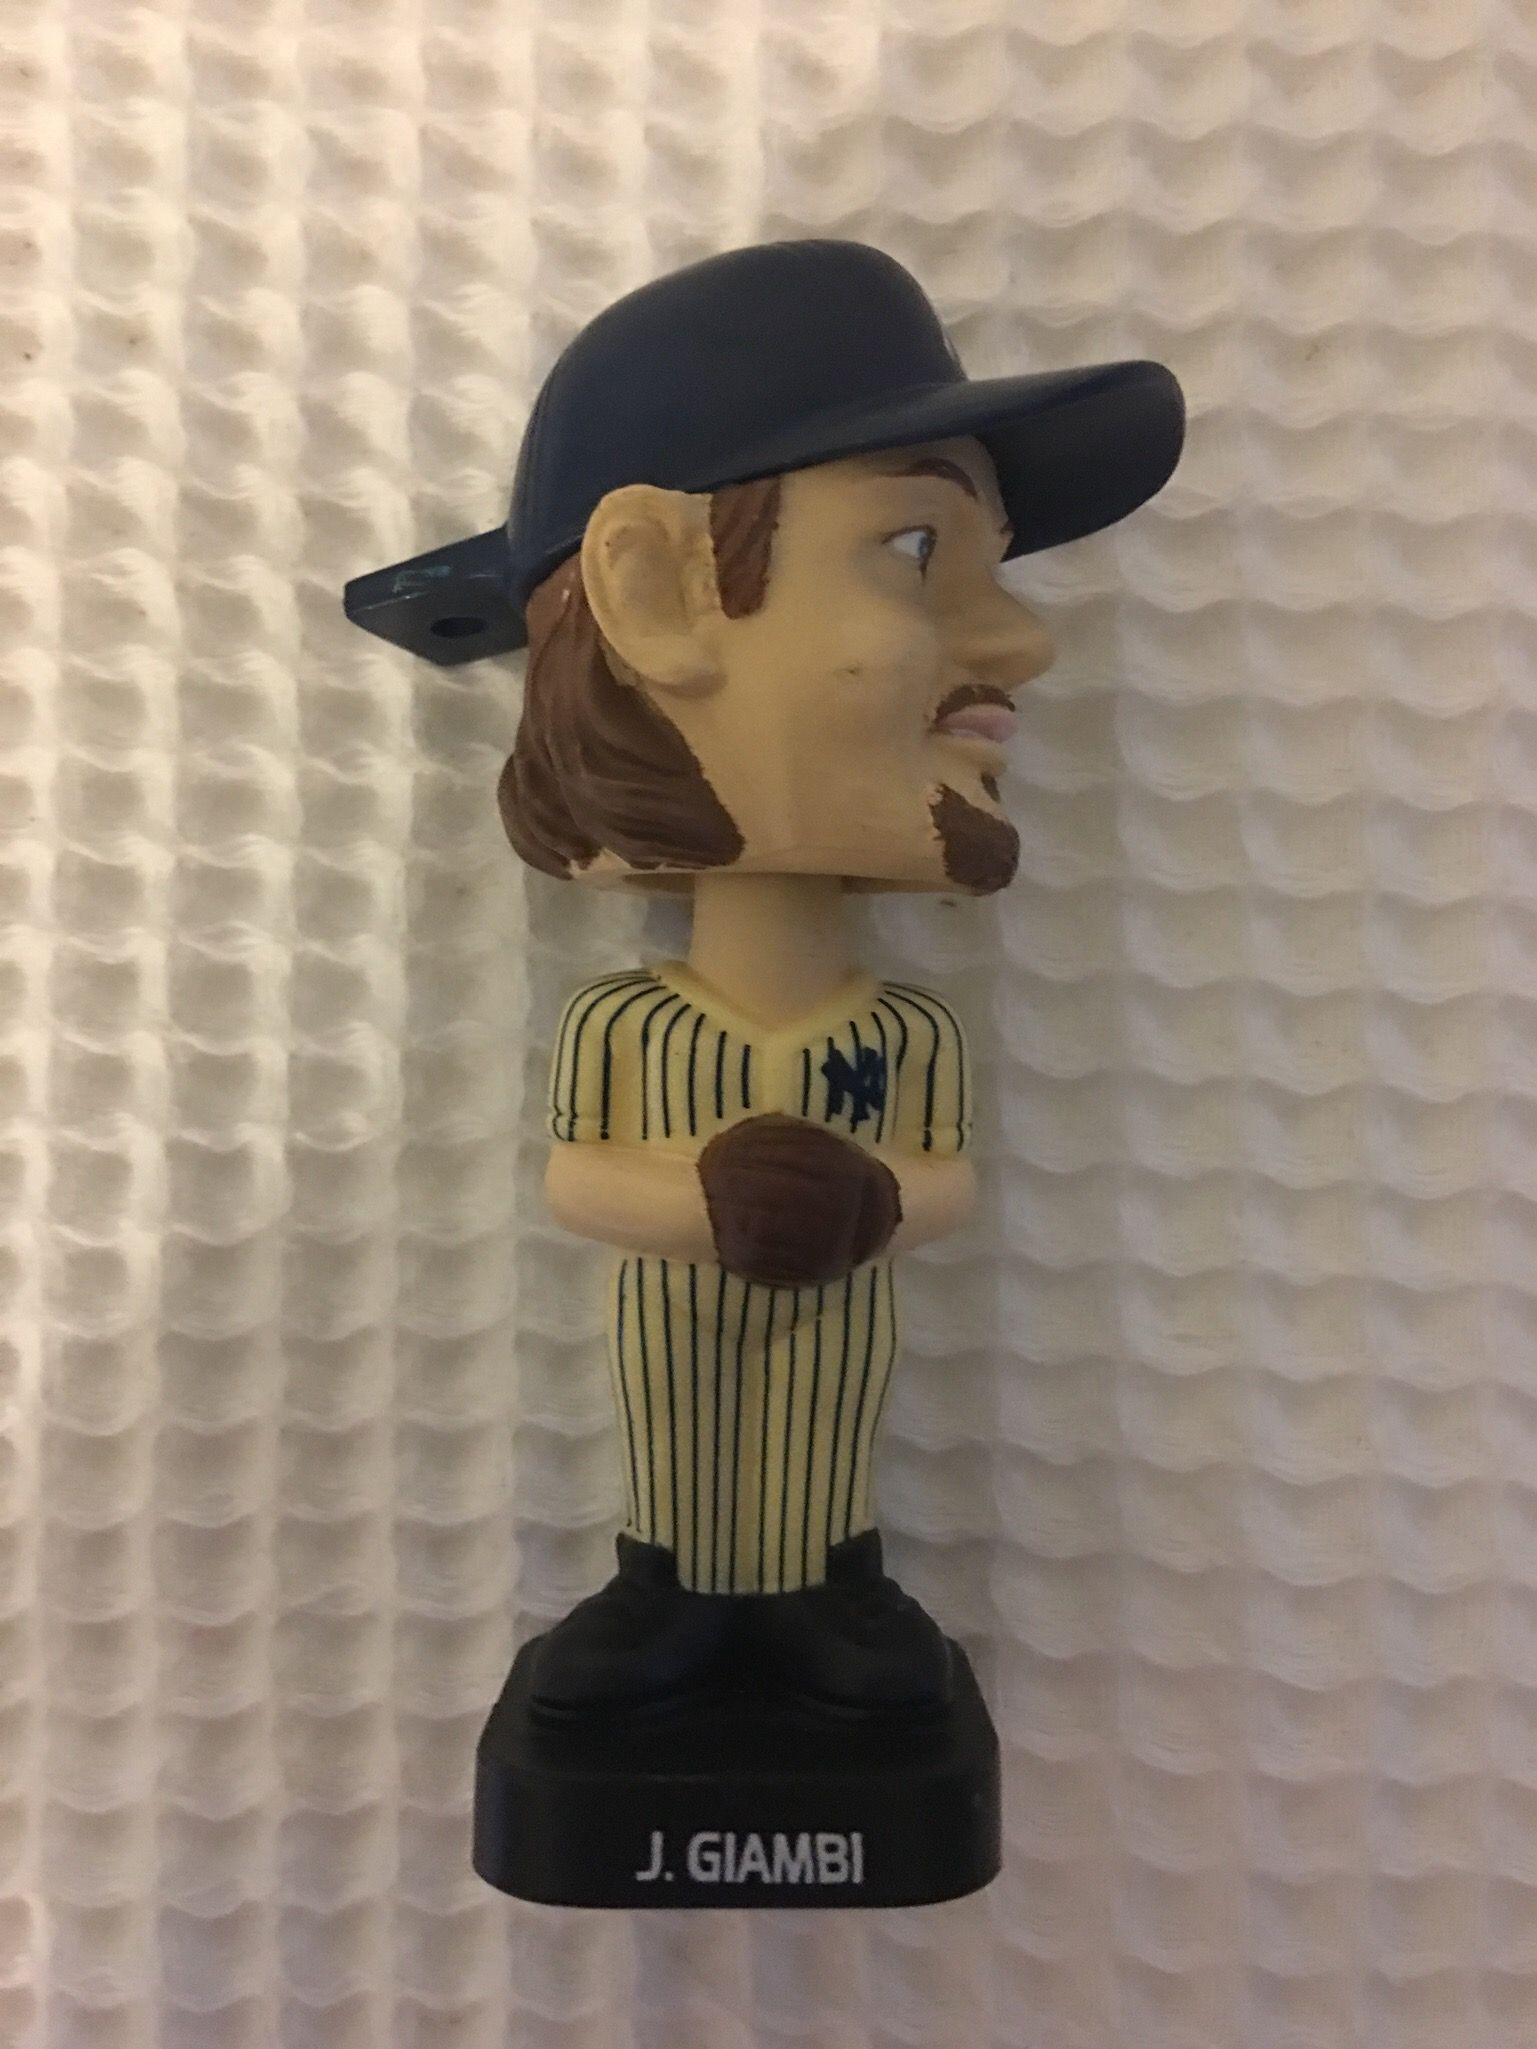 Pin By Ivan Matos On Ny Yankees Collection Ny Yankees Yankees Collection